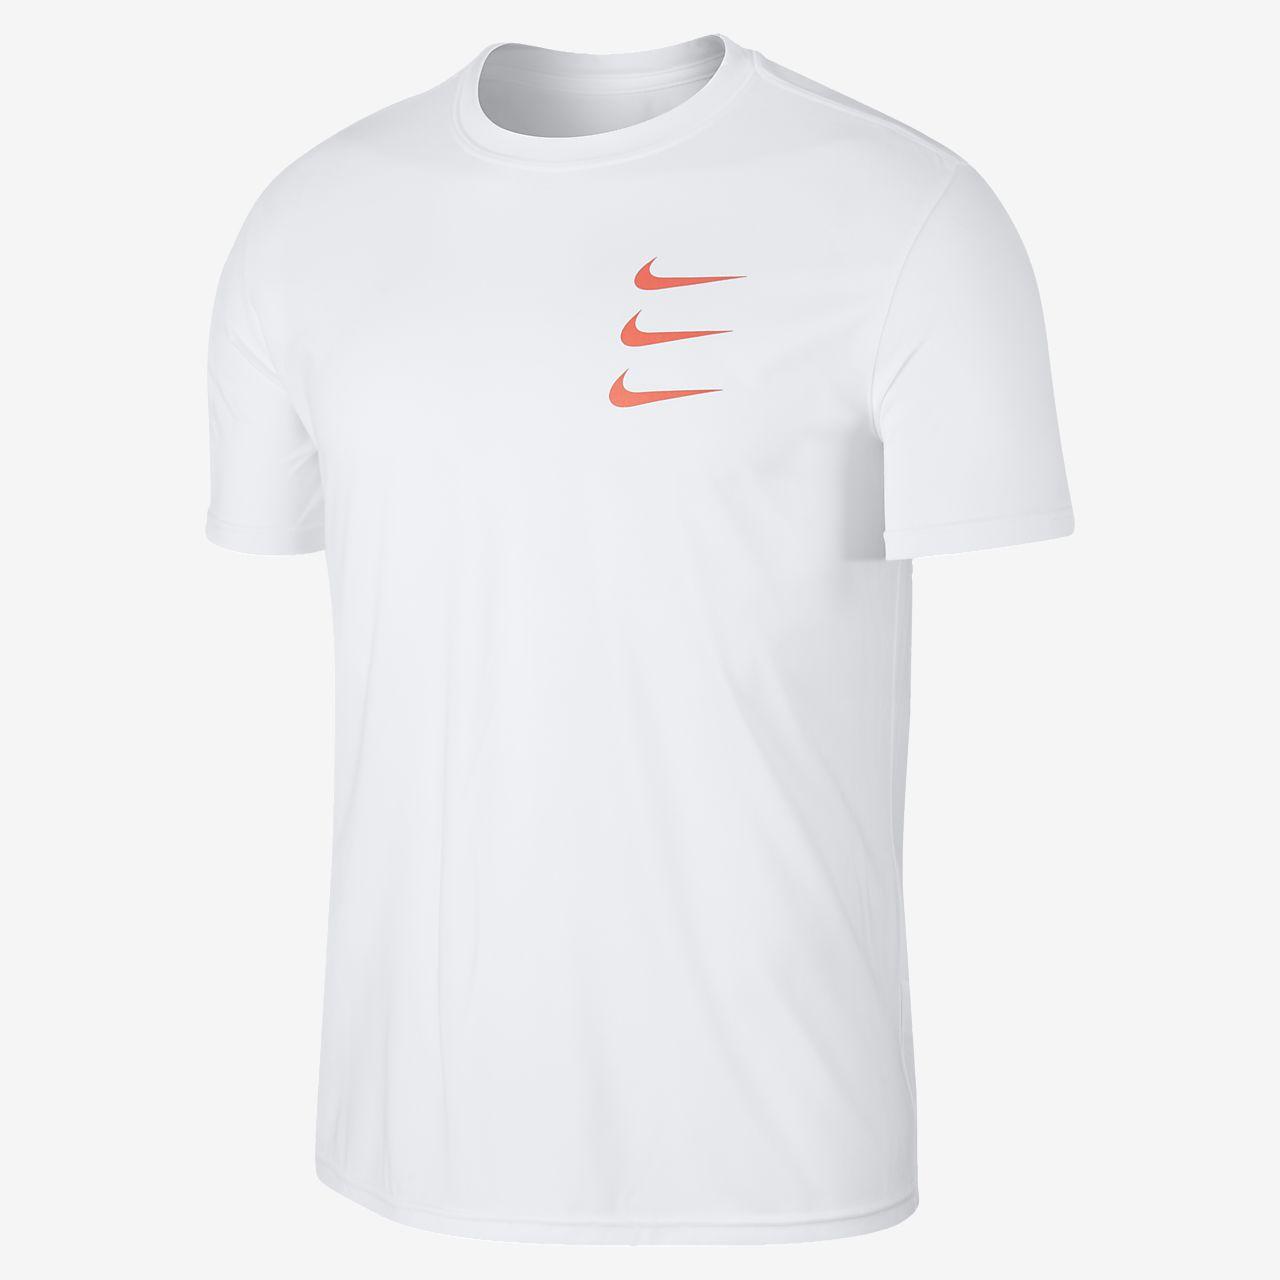 331dd6d7d2cb7 Tee-shirt de running Nike Dri-FIT (London) pour Homme. Nike.com FR